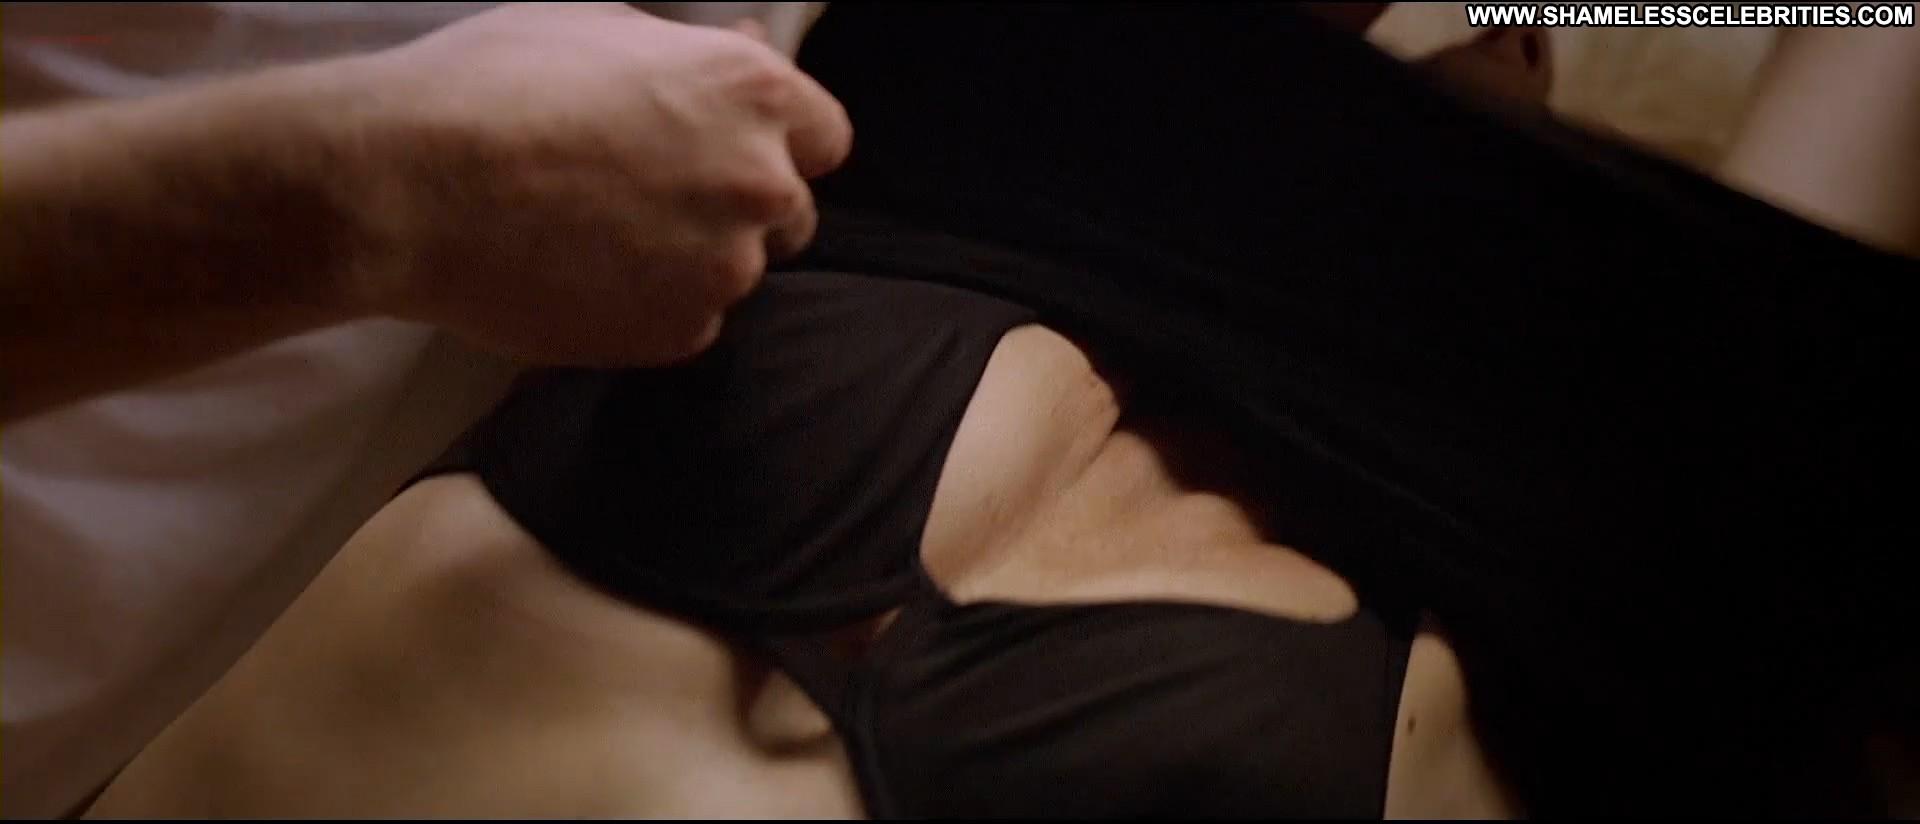 Bgf sex live sex add snapchat pornzoe2525